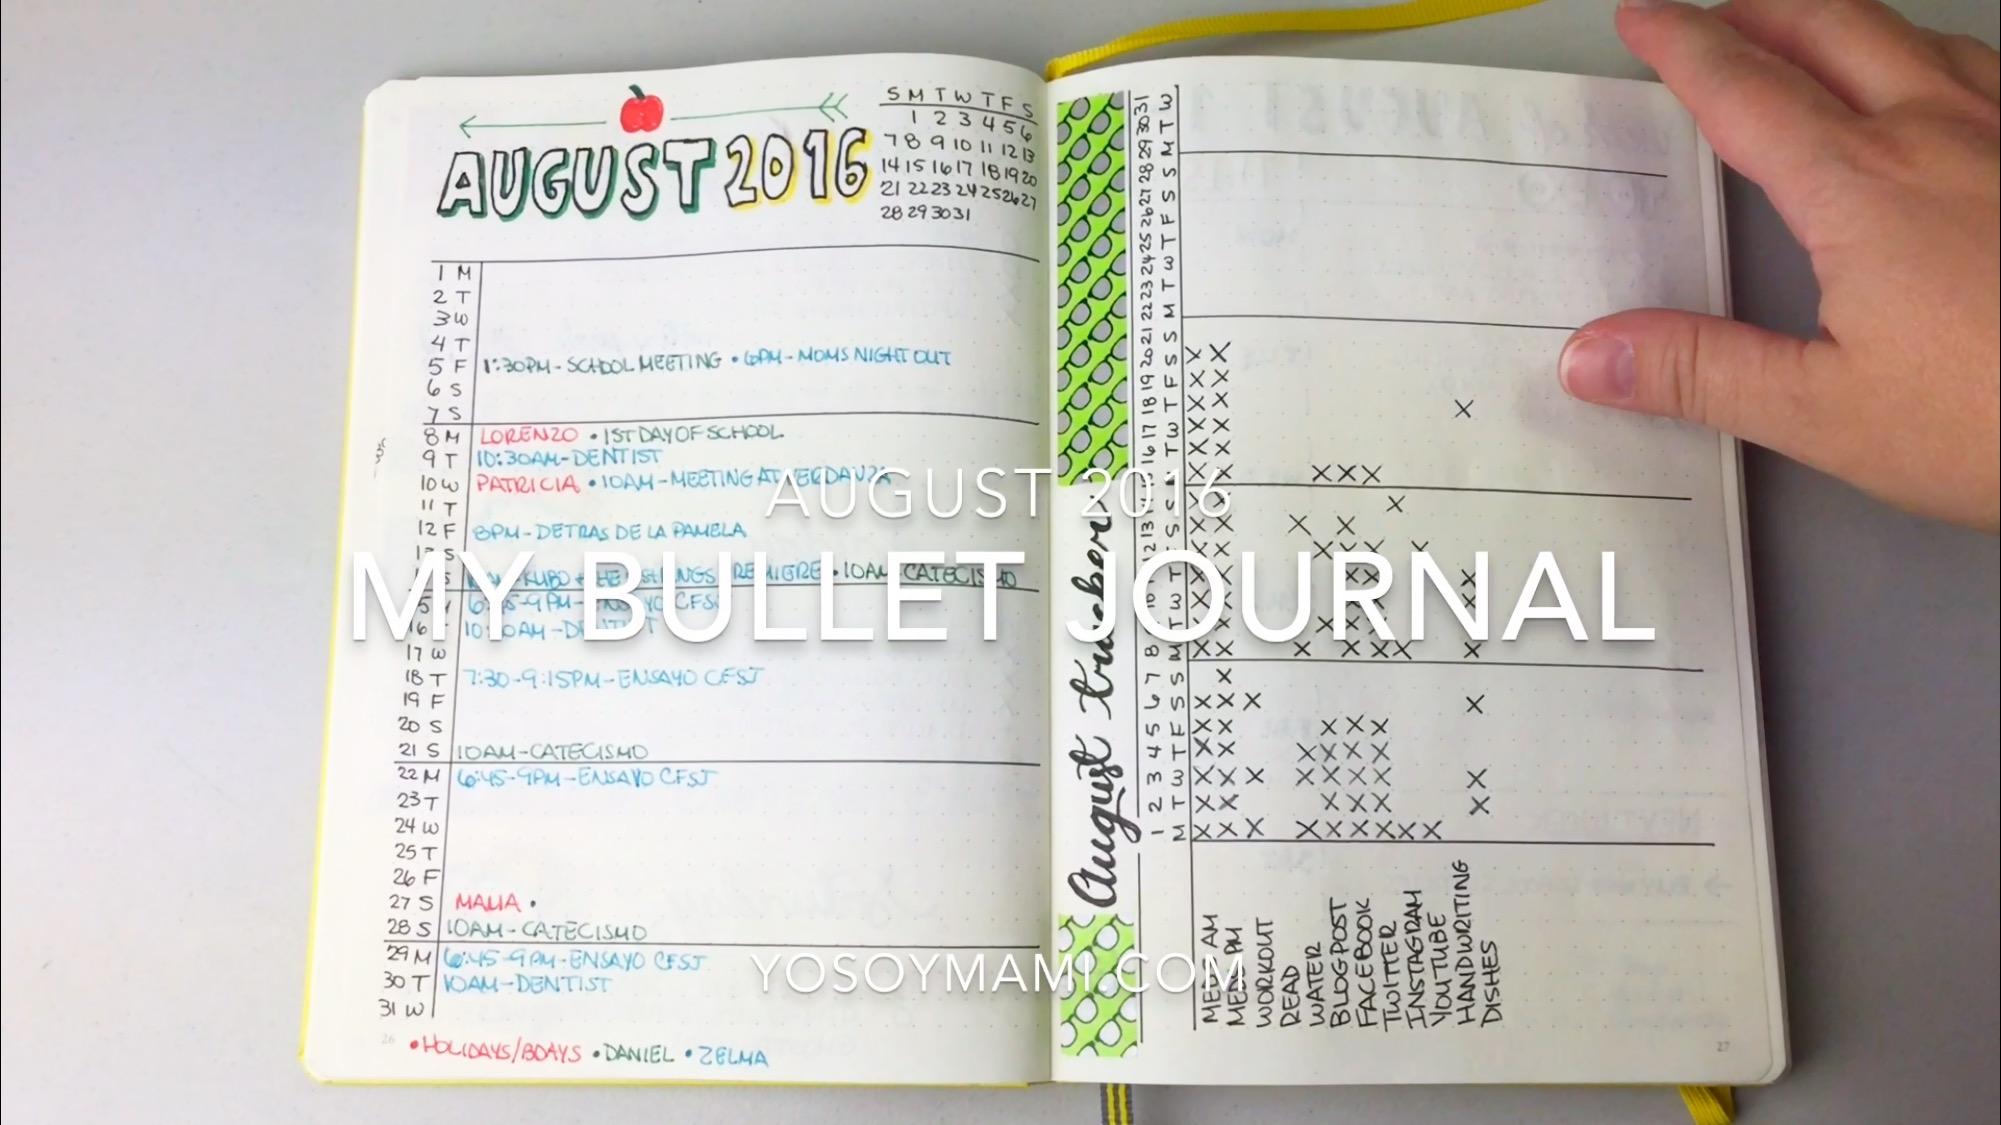 Mi Bullet Journal Para Agosto 2016 | @yosoymamipr